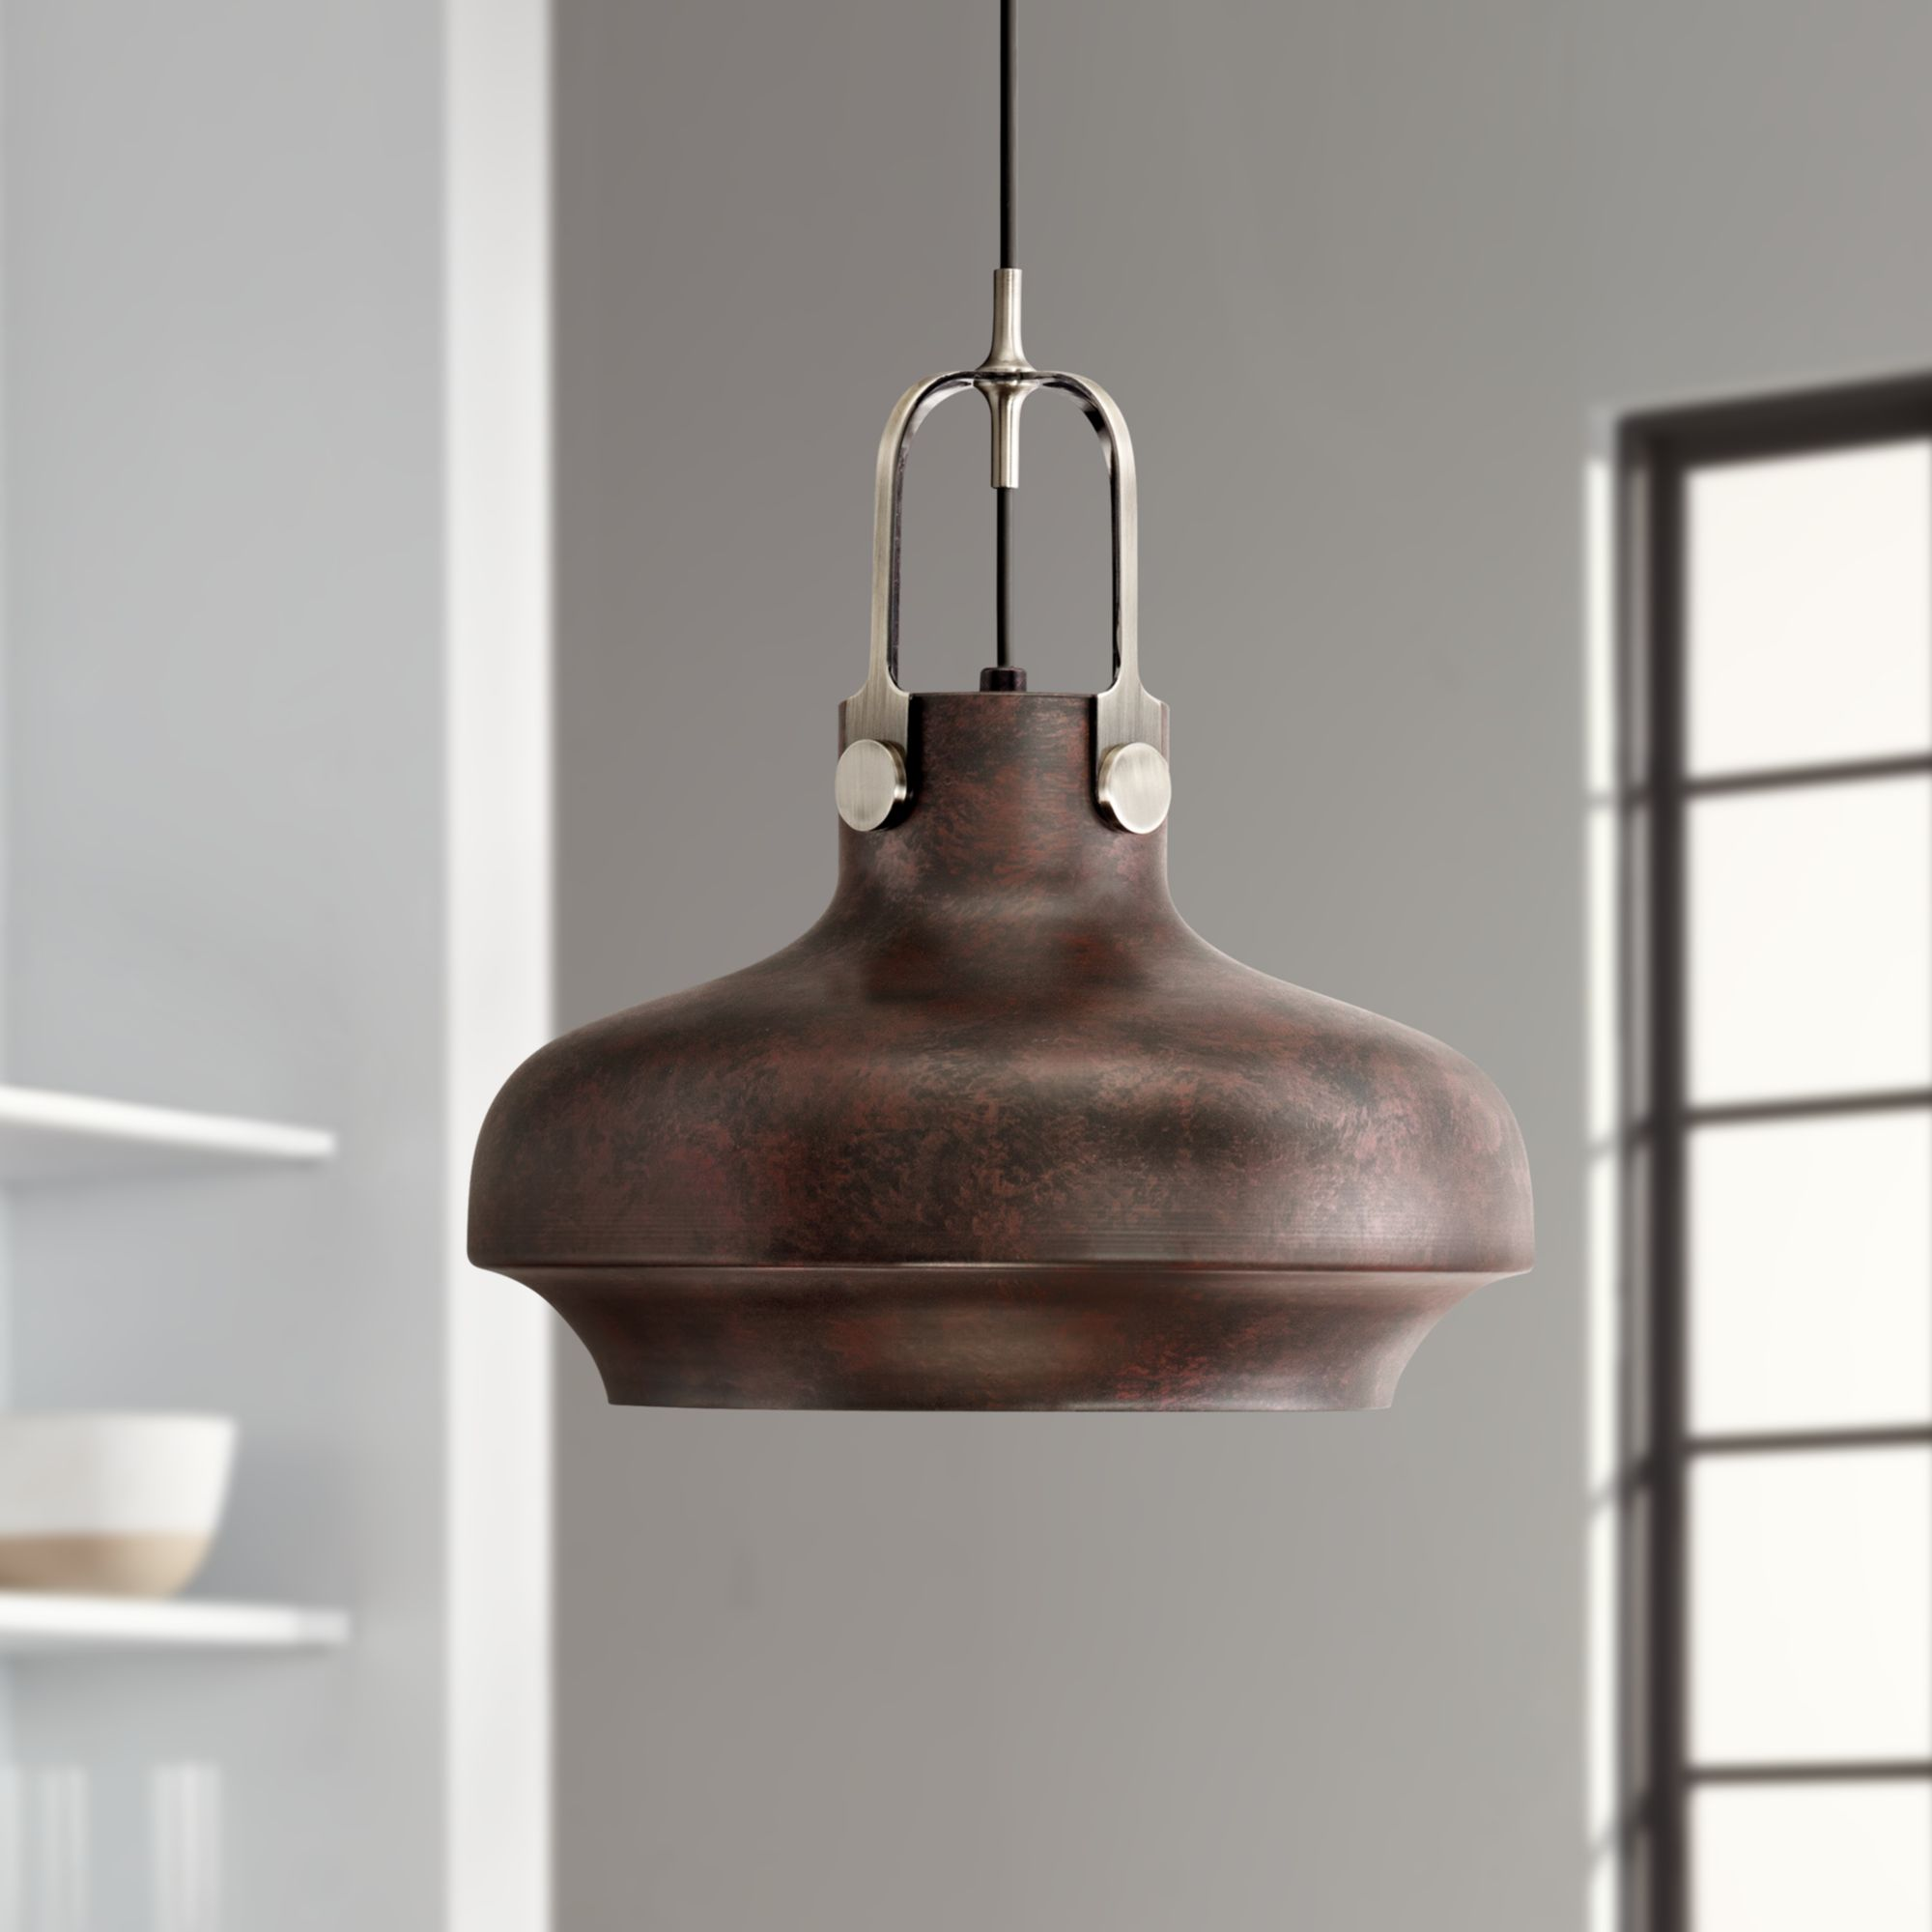 Possini Euro Design Antique Bronze Pendant Light 14 Wide Industrial Rustic Farmhouse Fixture For Kitchen Island Dining Room Walmart Com Walmart Com